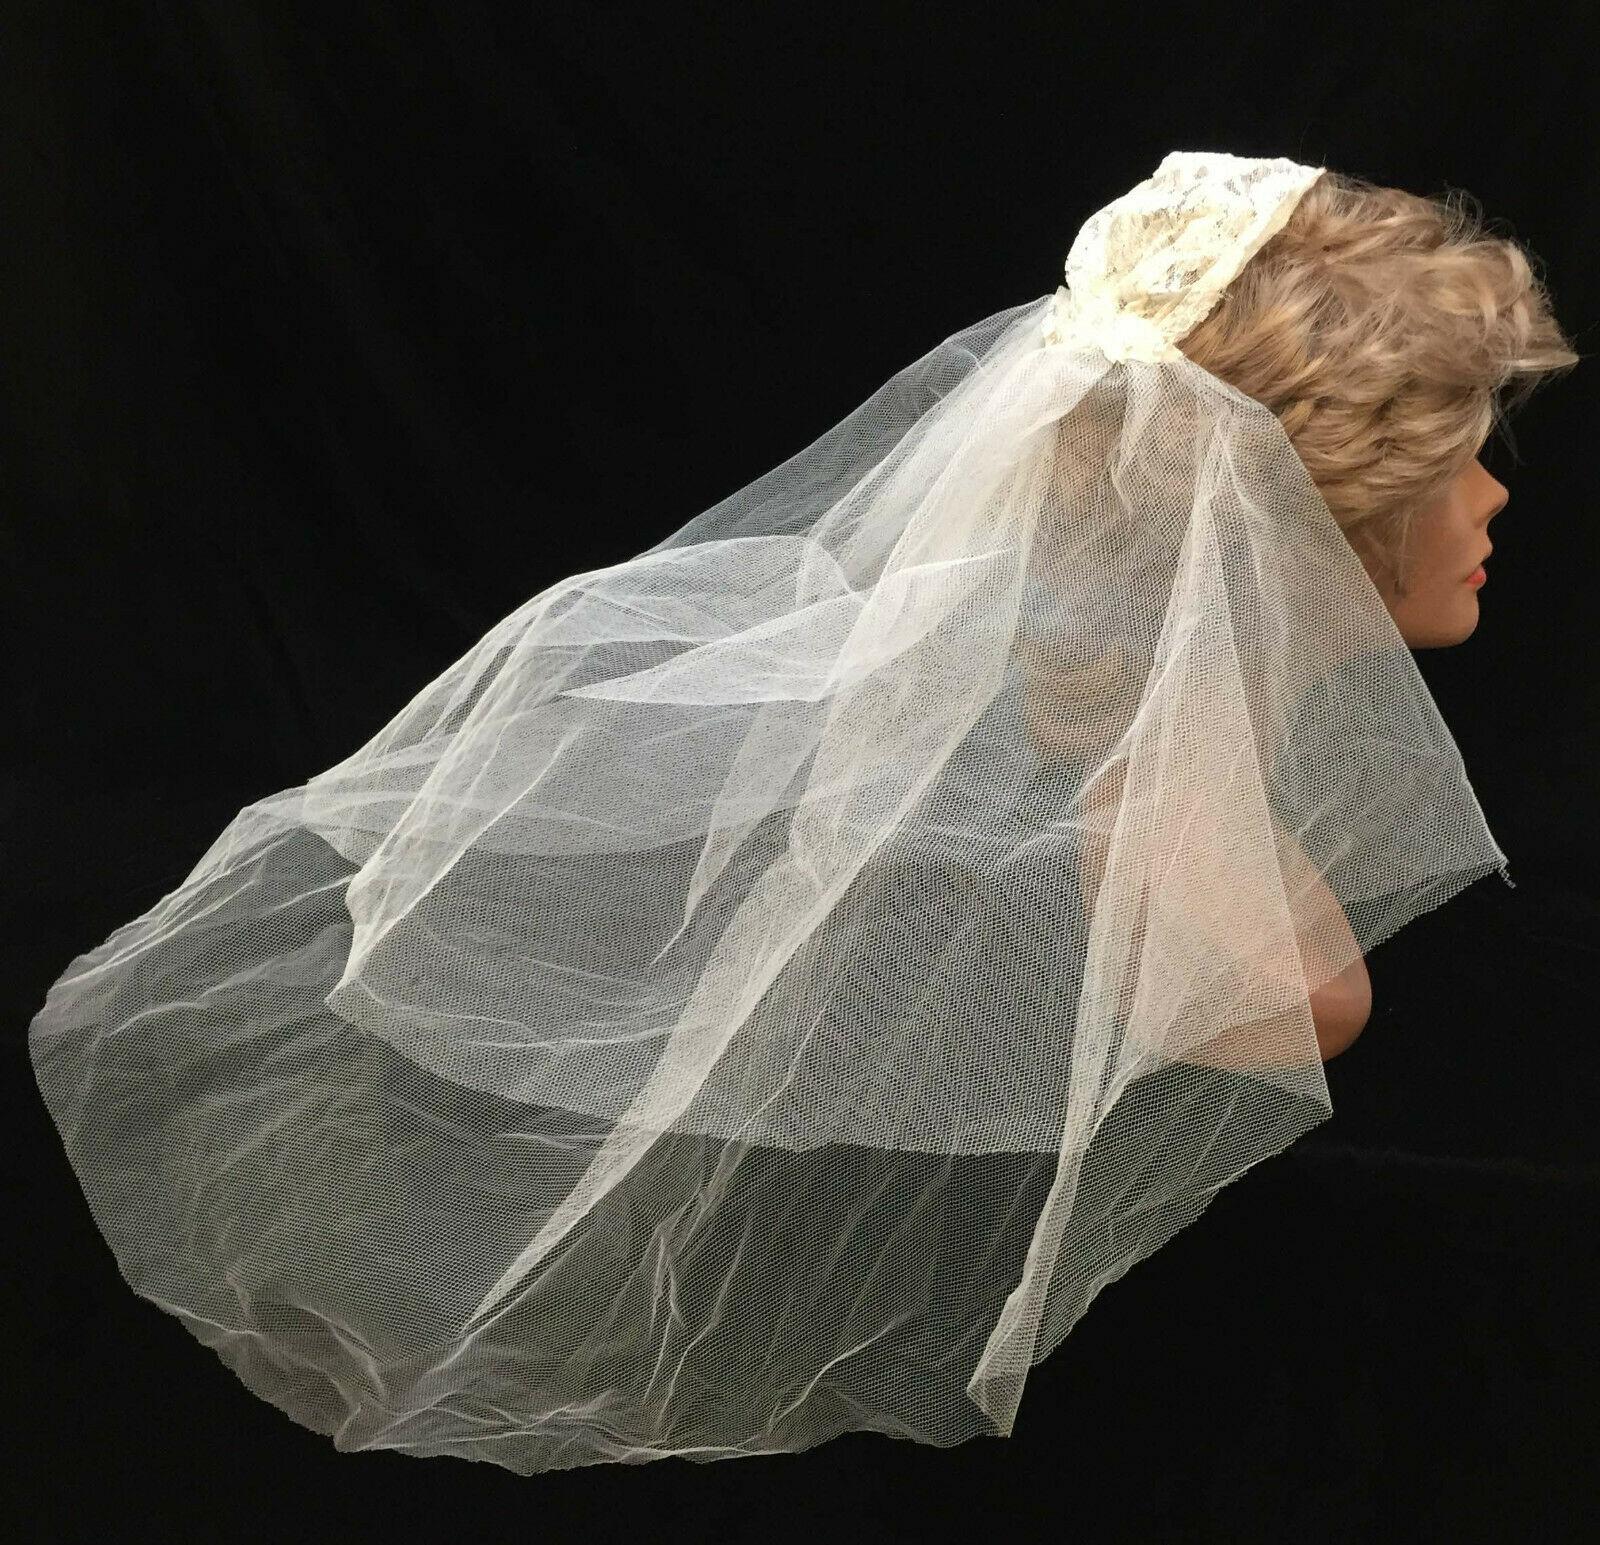 dbbabe77ce51 Wedding Veil Vintage Lace Cap Hair Piece Head Gossamer Mesh Net Gathered -  $34.64